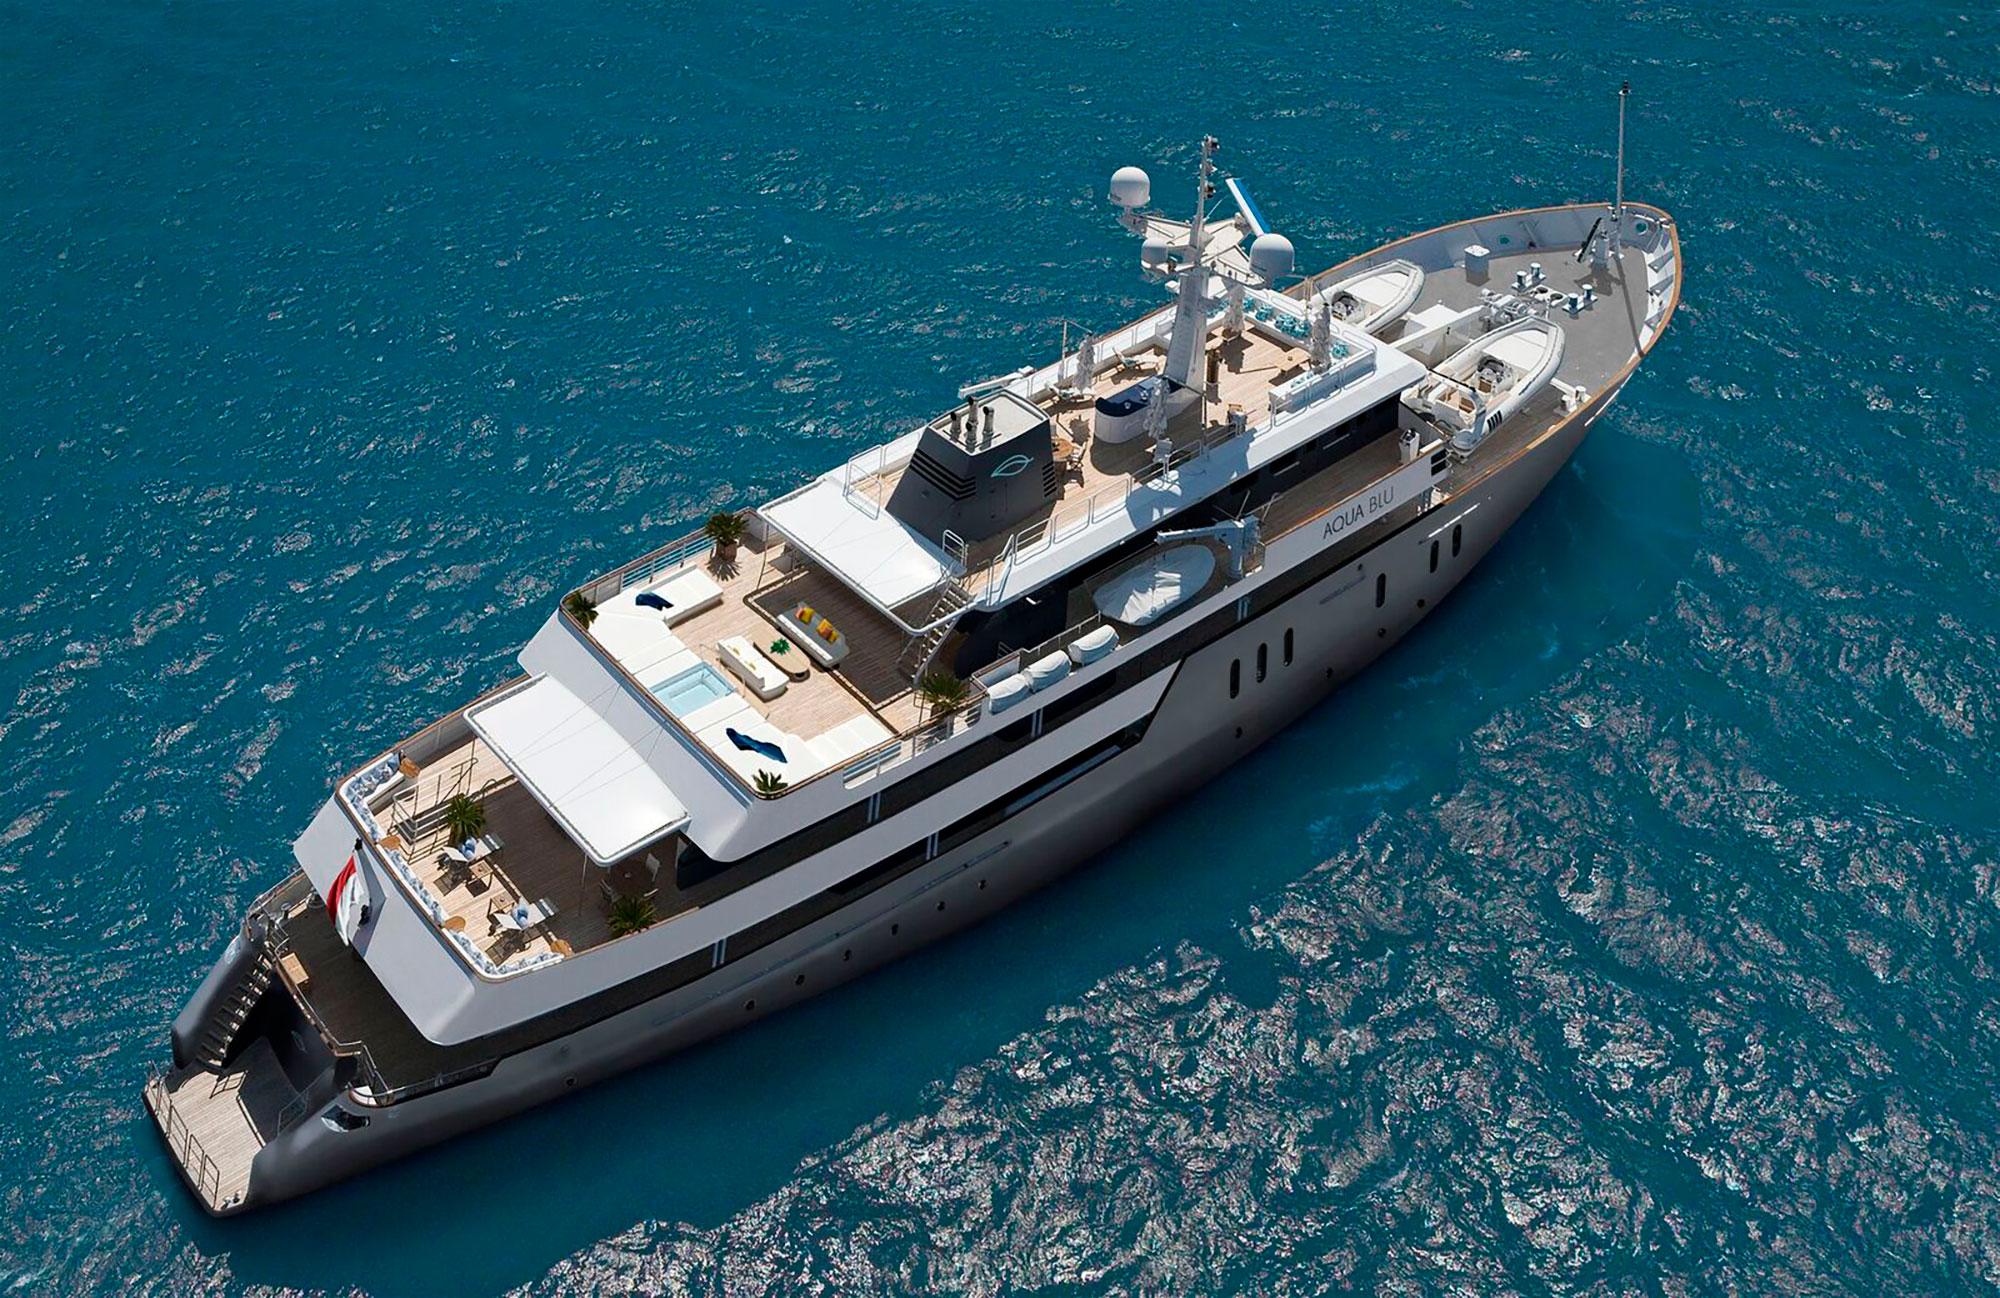 Crucero AQUA BLU de 12 noches - Flores to Spice Islands - Indonesia- imagen #6